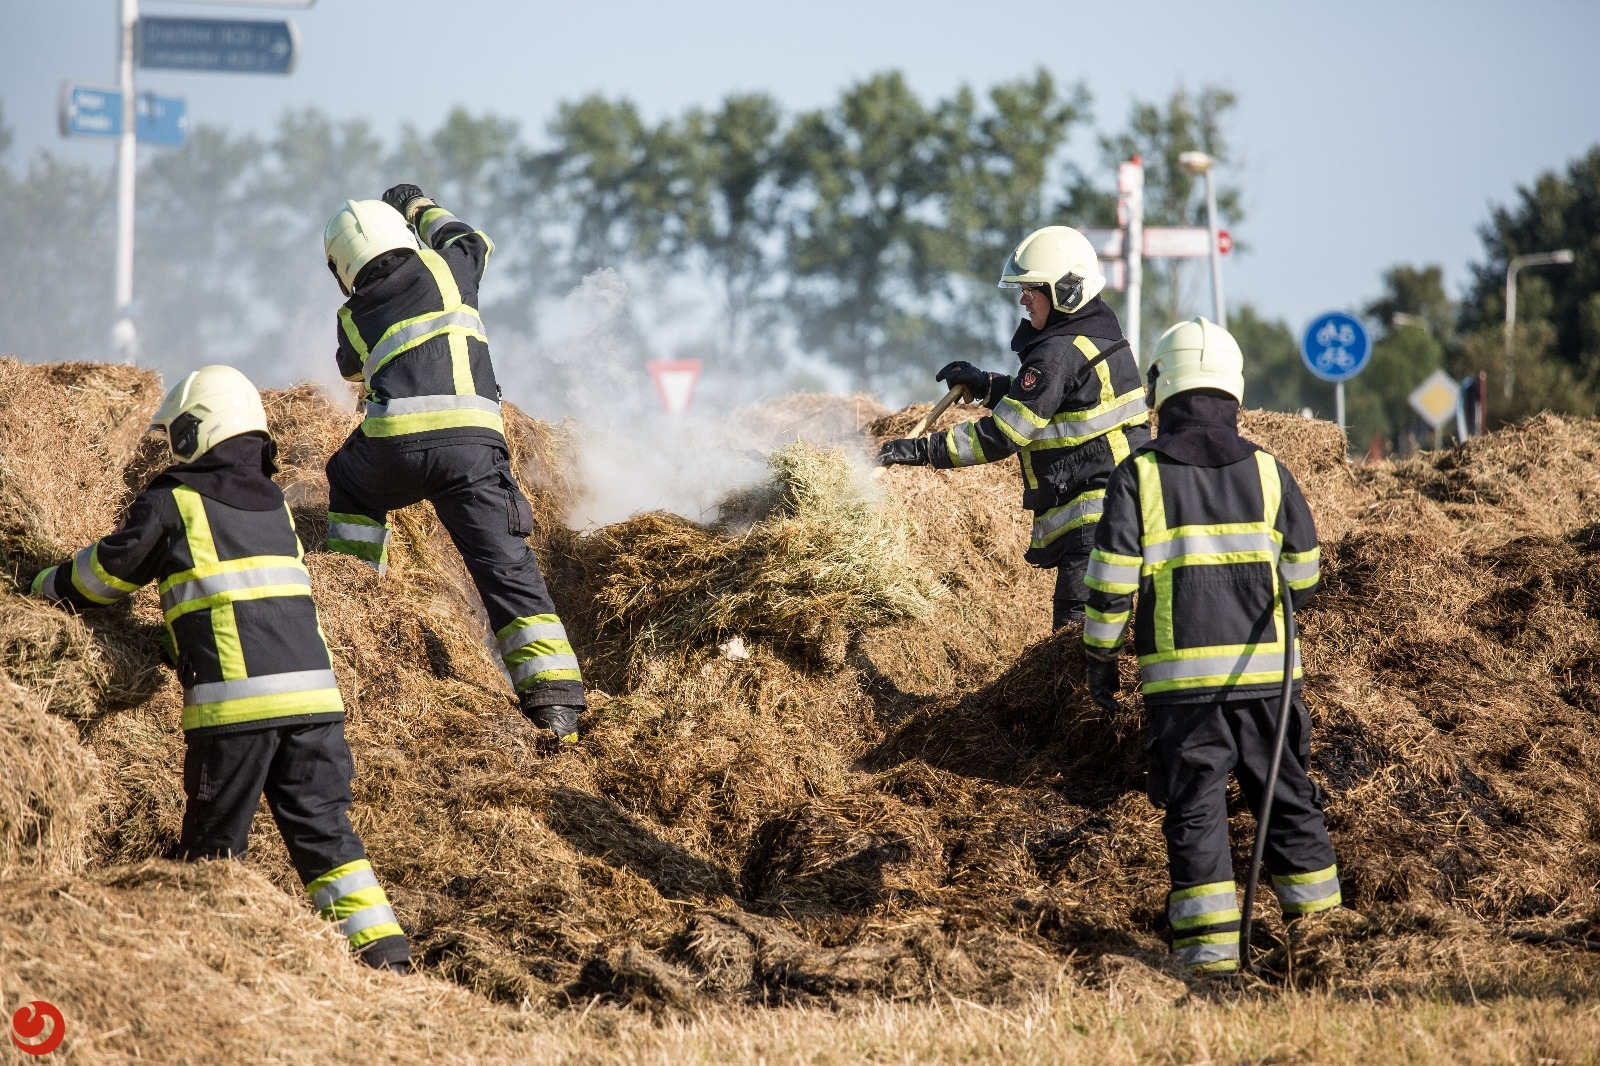 Aanhoudende droogte: wees alert op natuurbranden